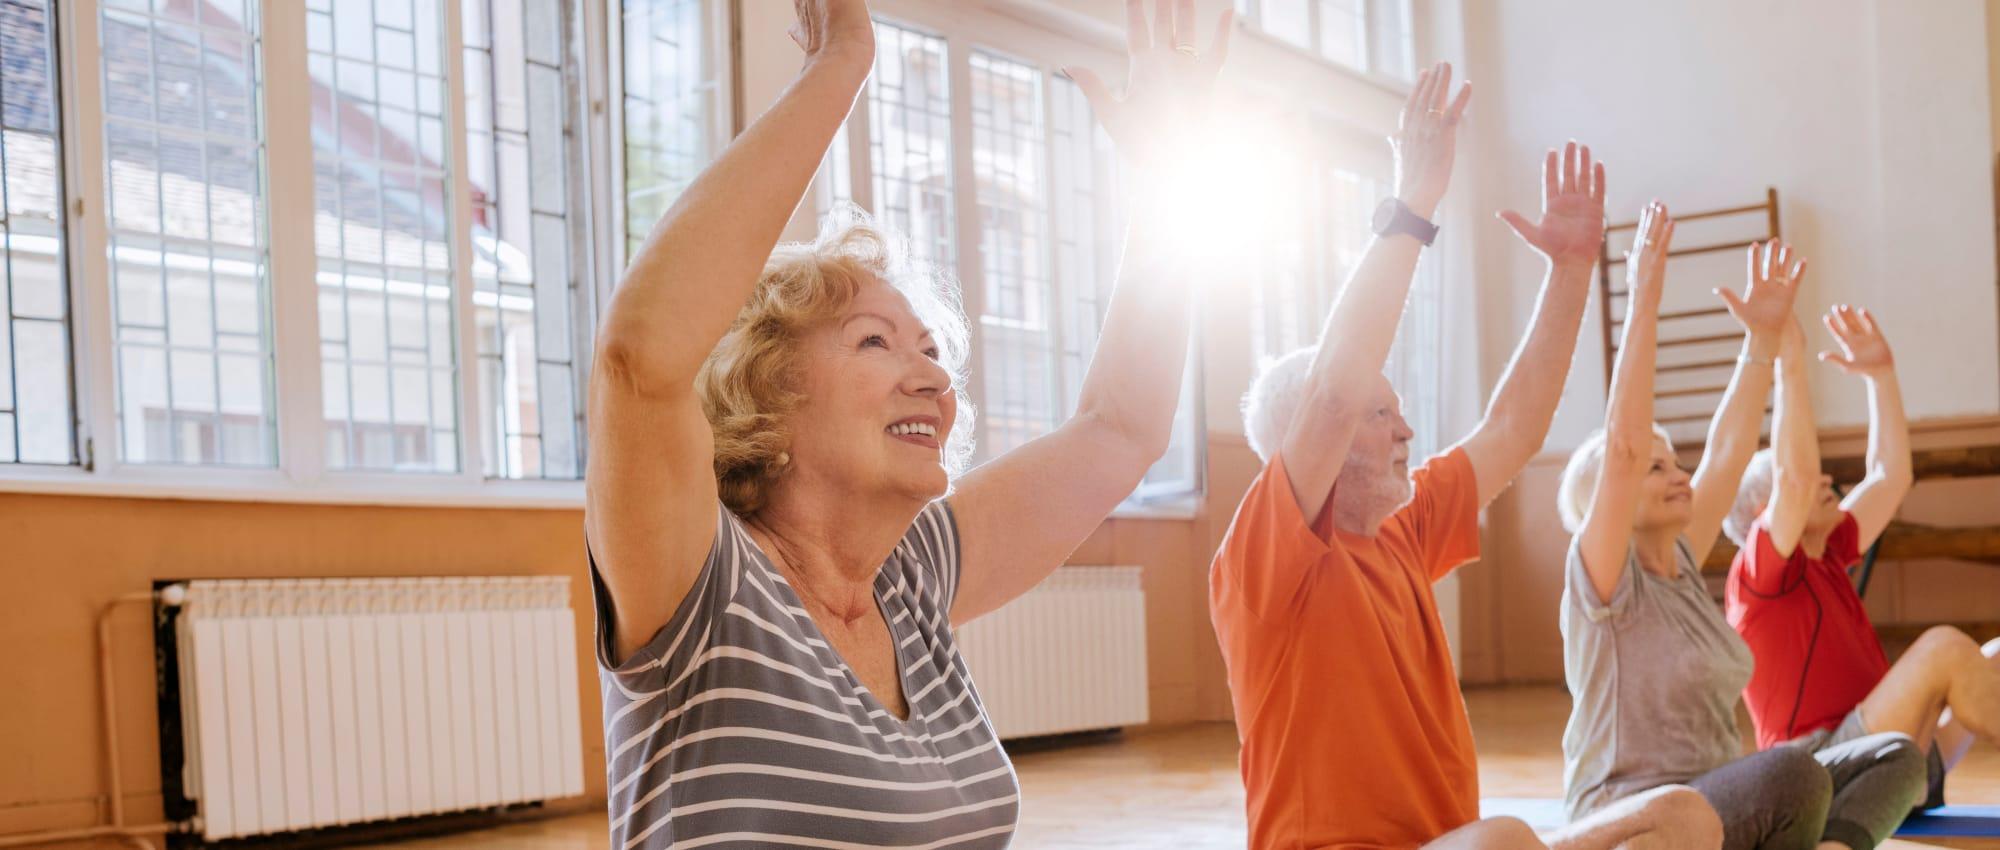 Our programs at Milestone Senior Living Faribault in Faribault, Minnesota.